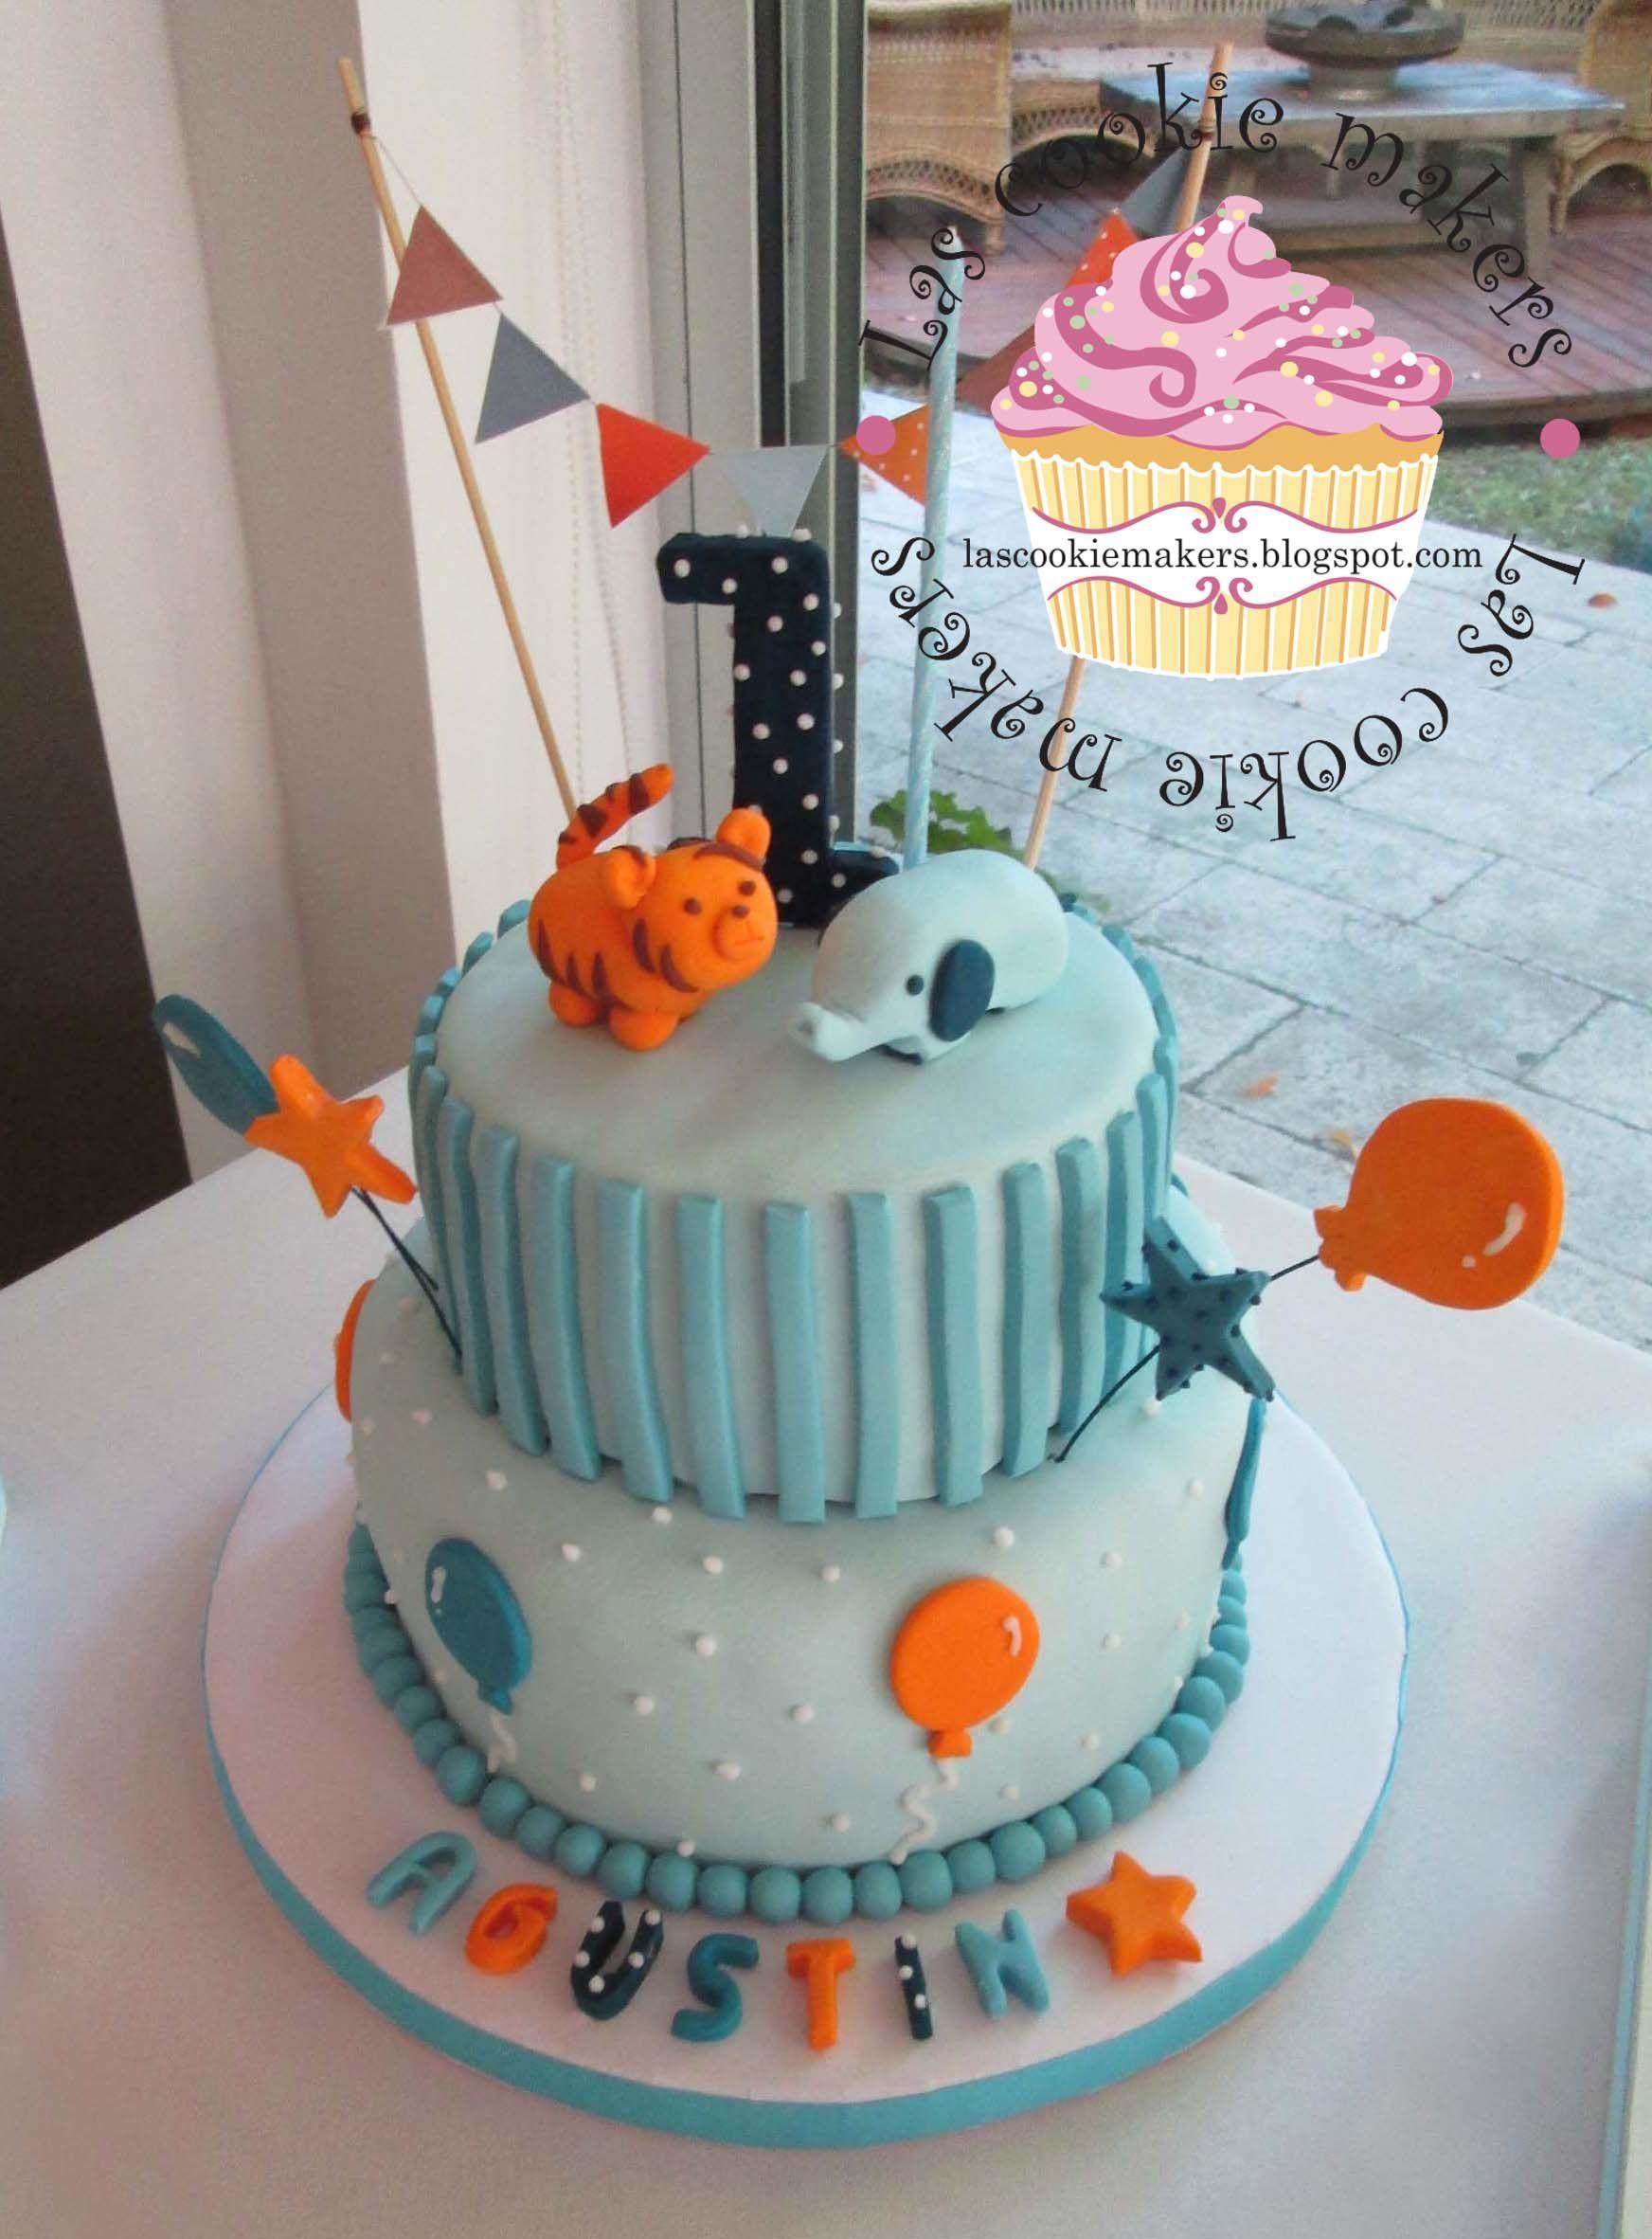 First year birthday cake for boy torta para 1er a o varon - Decoracion cumpleanos 1 ano ...